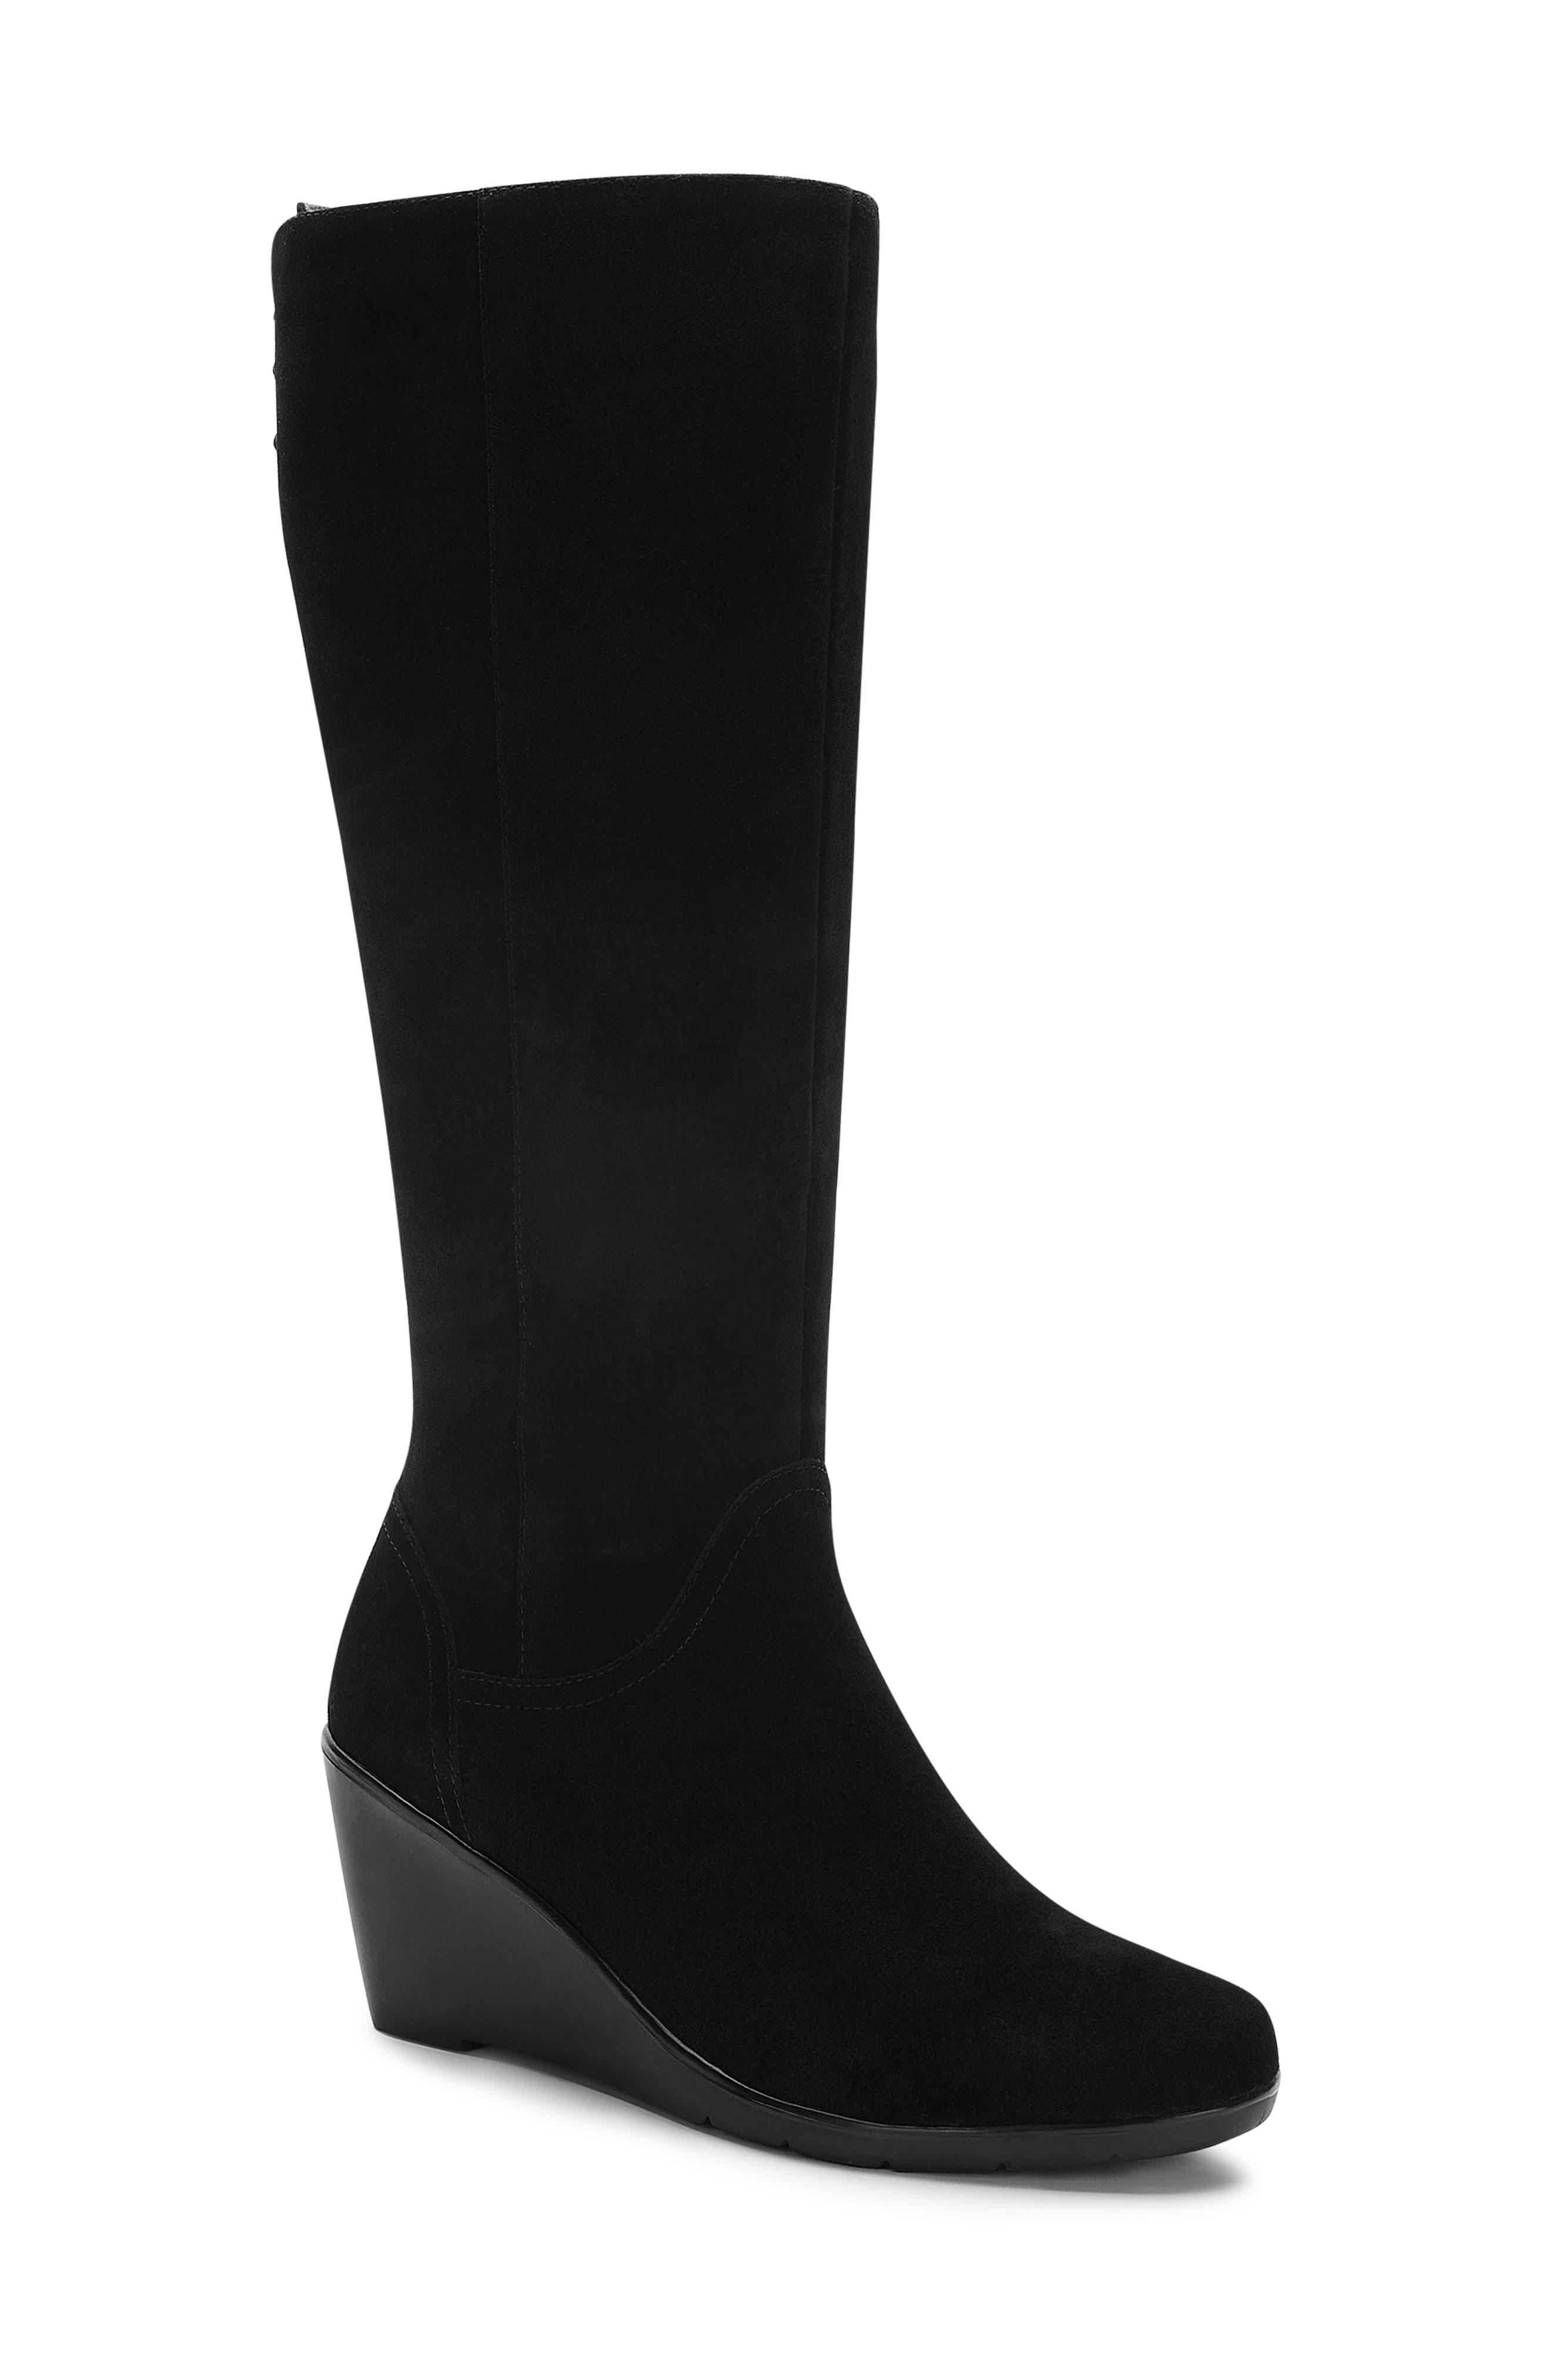 BLONDO, Larissa Waterproof Wedge Knee High Boot, Main thumbnail 1, color, BLACK SUEDE